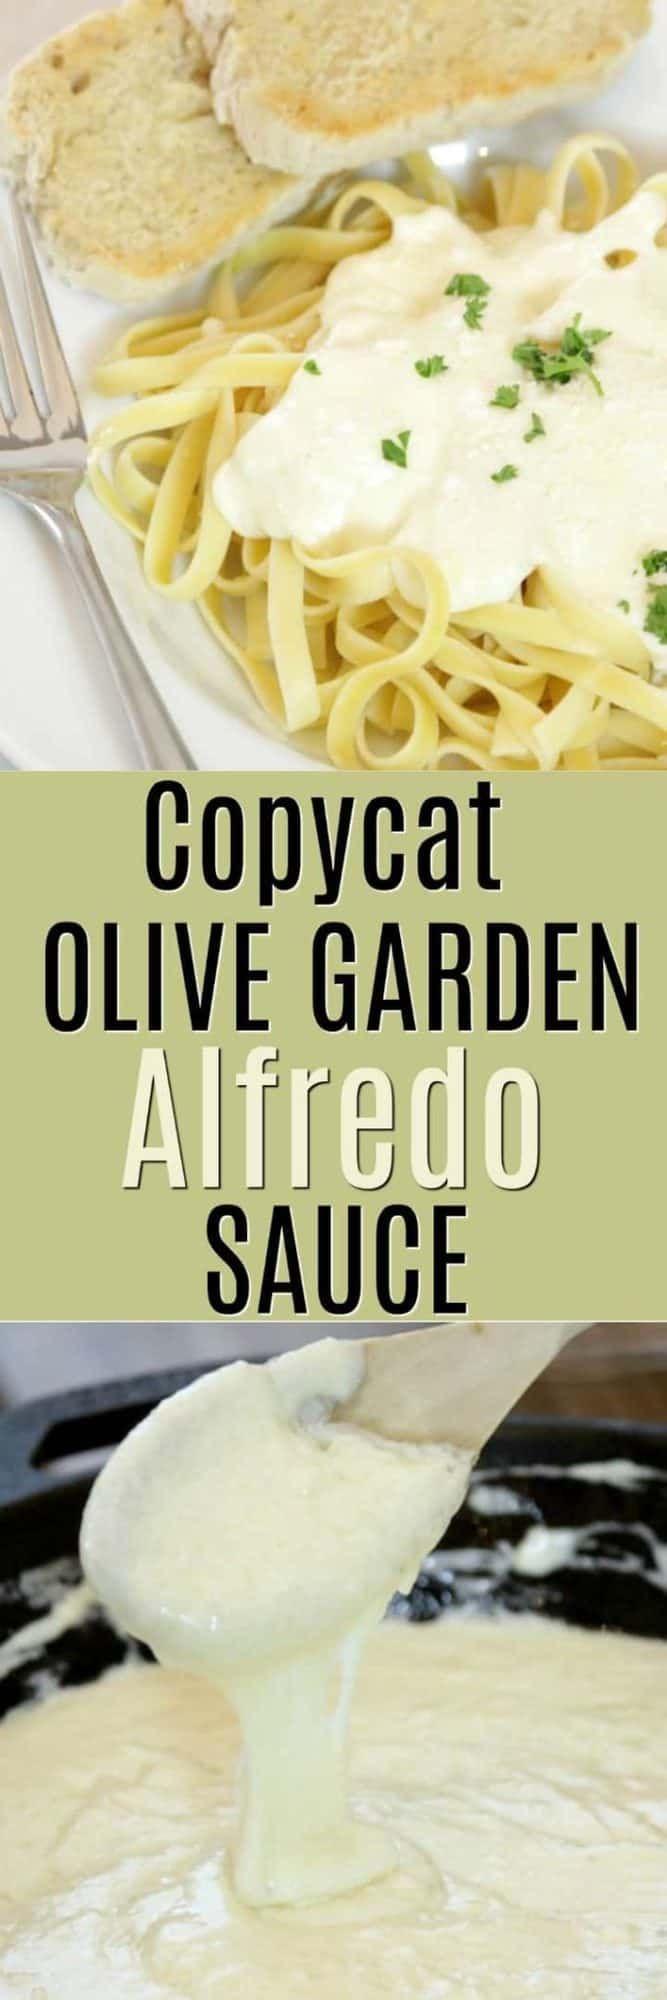 How to make Copycat Olive Garden Fettuccini Alfredo Sauce ...